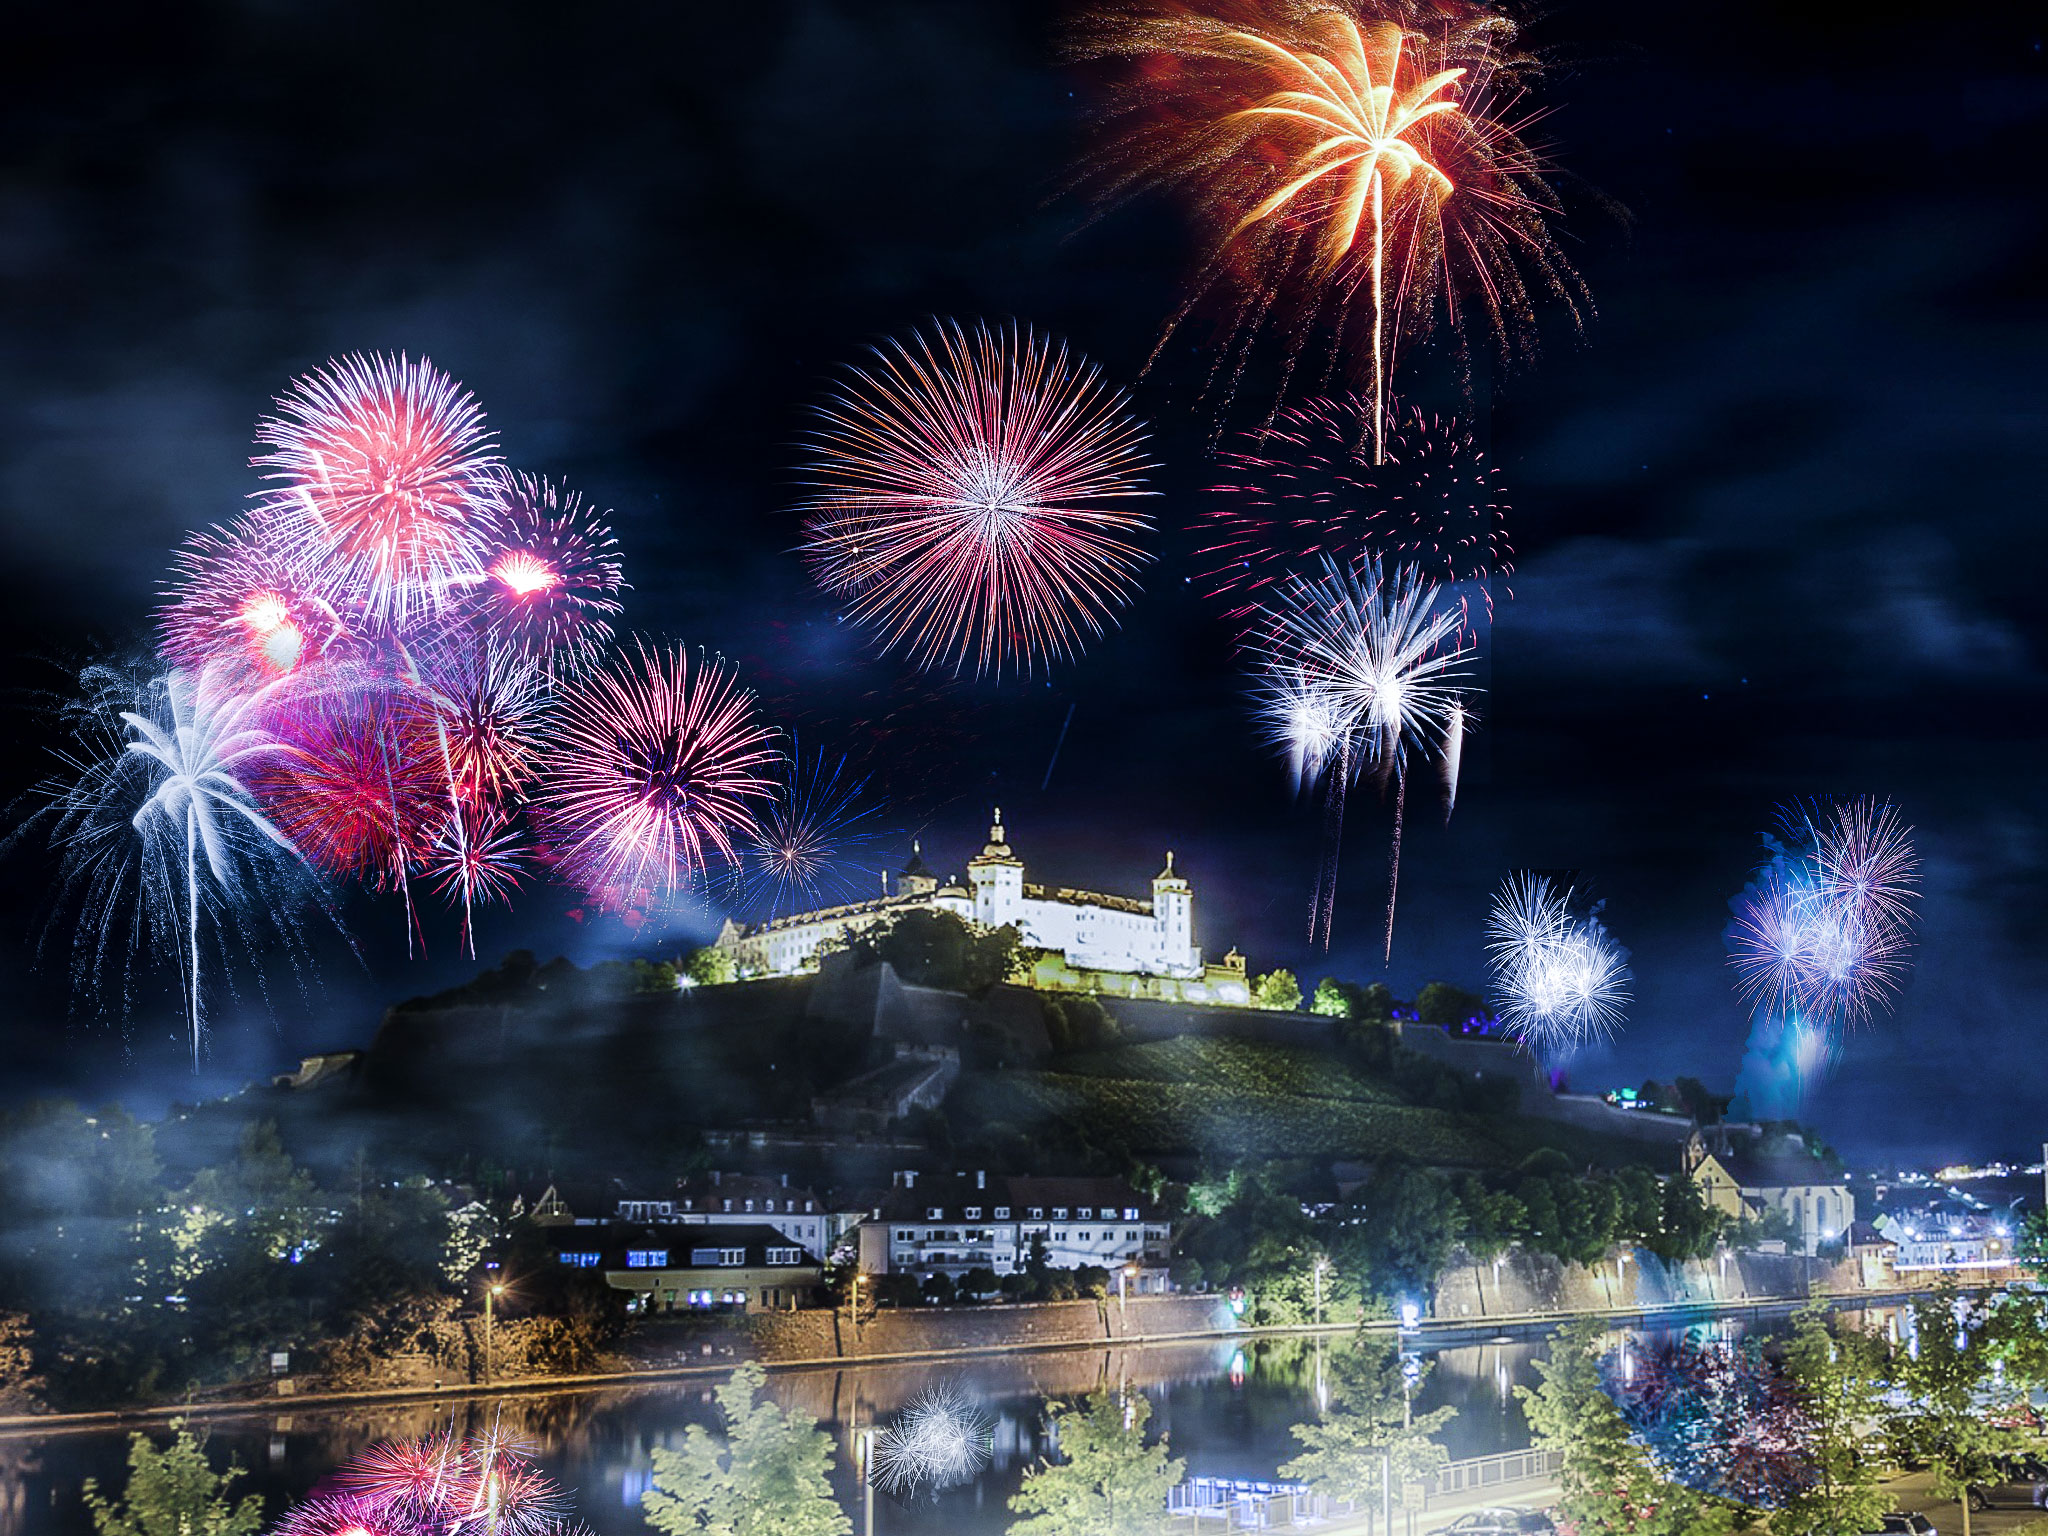 Feuerwerk über der Festung Marienberg. Foto: Pascal Höfig